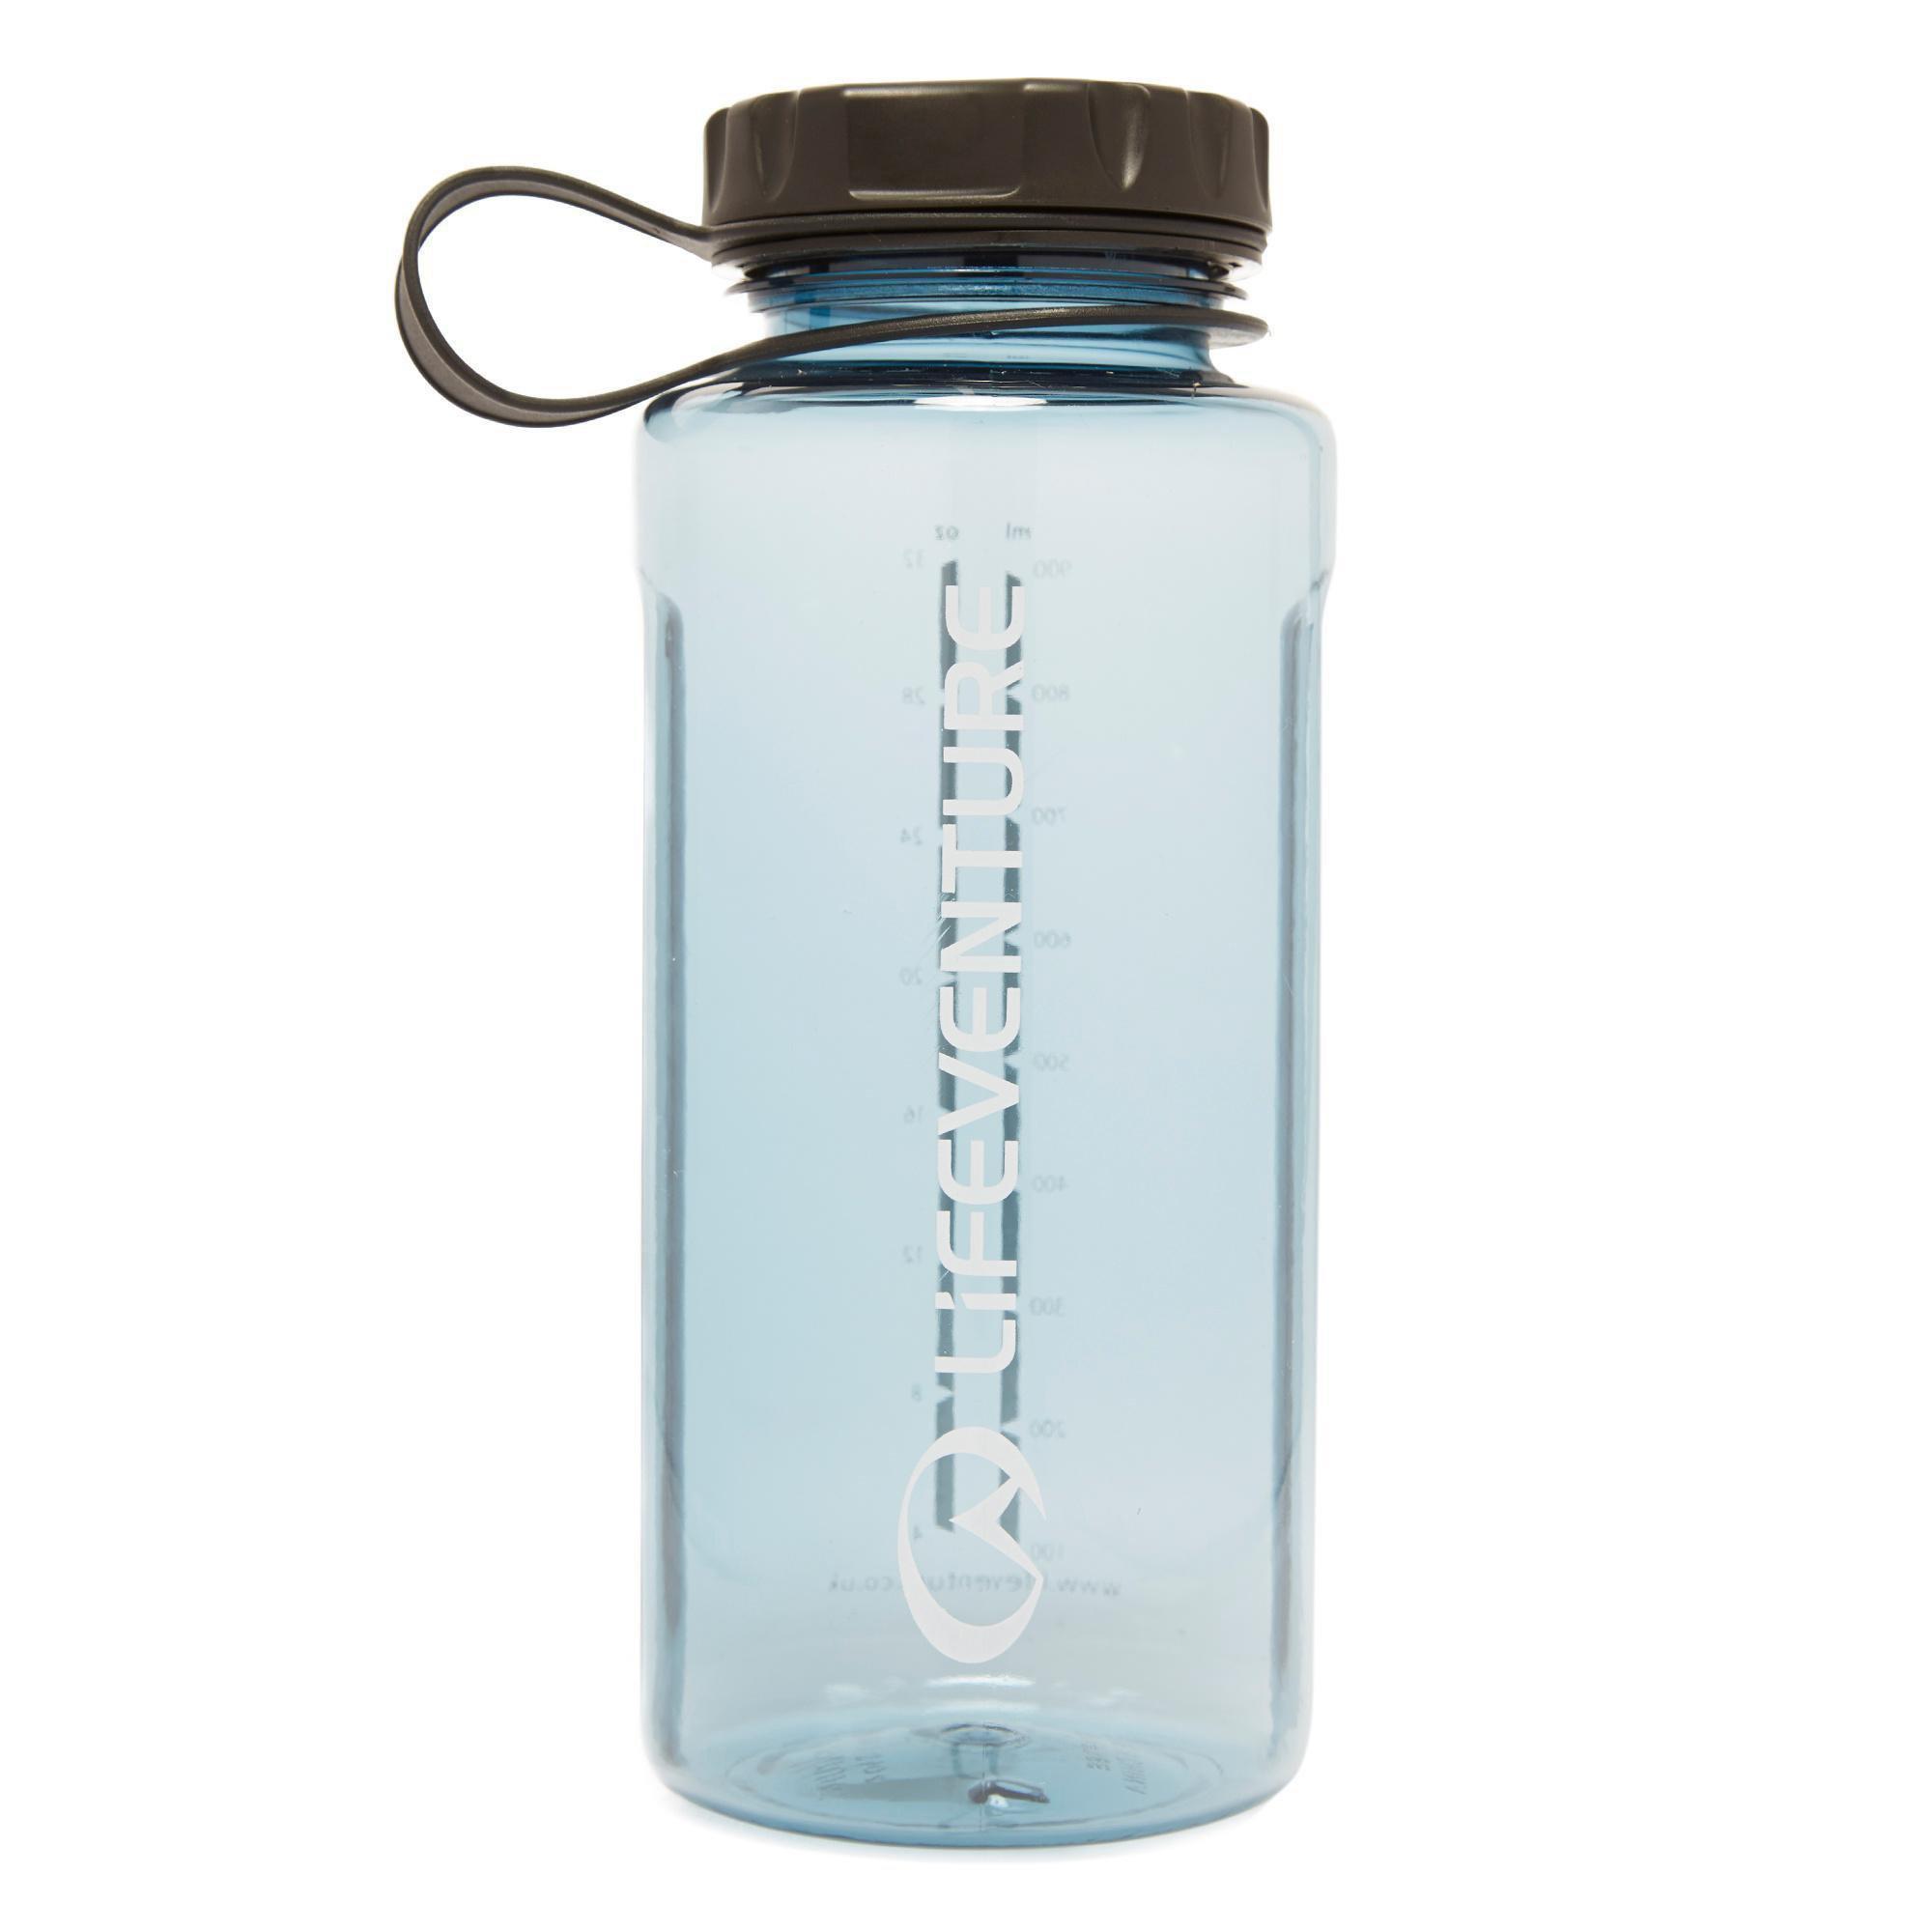 Lifeventure Lifeventure Tritan 1 Litre Flask - Blue, Blue